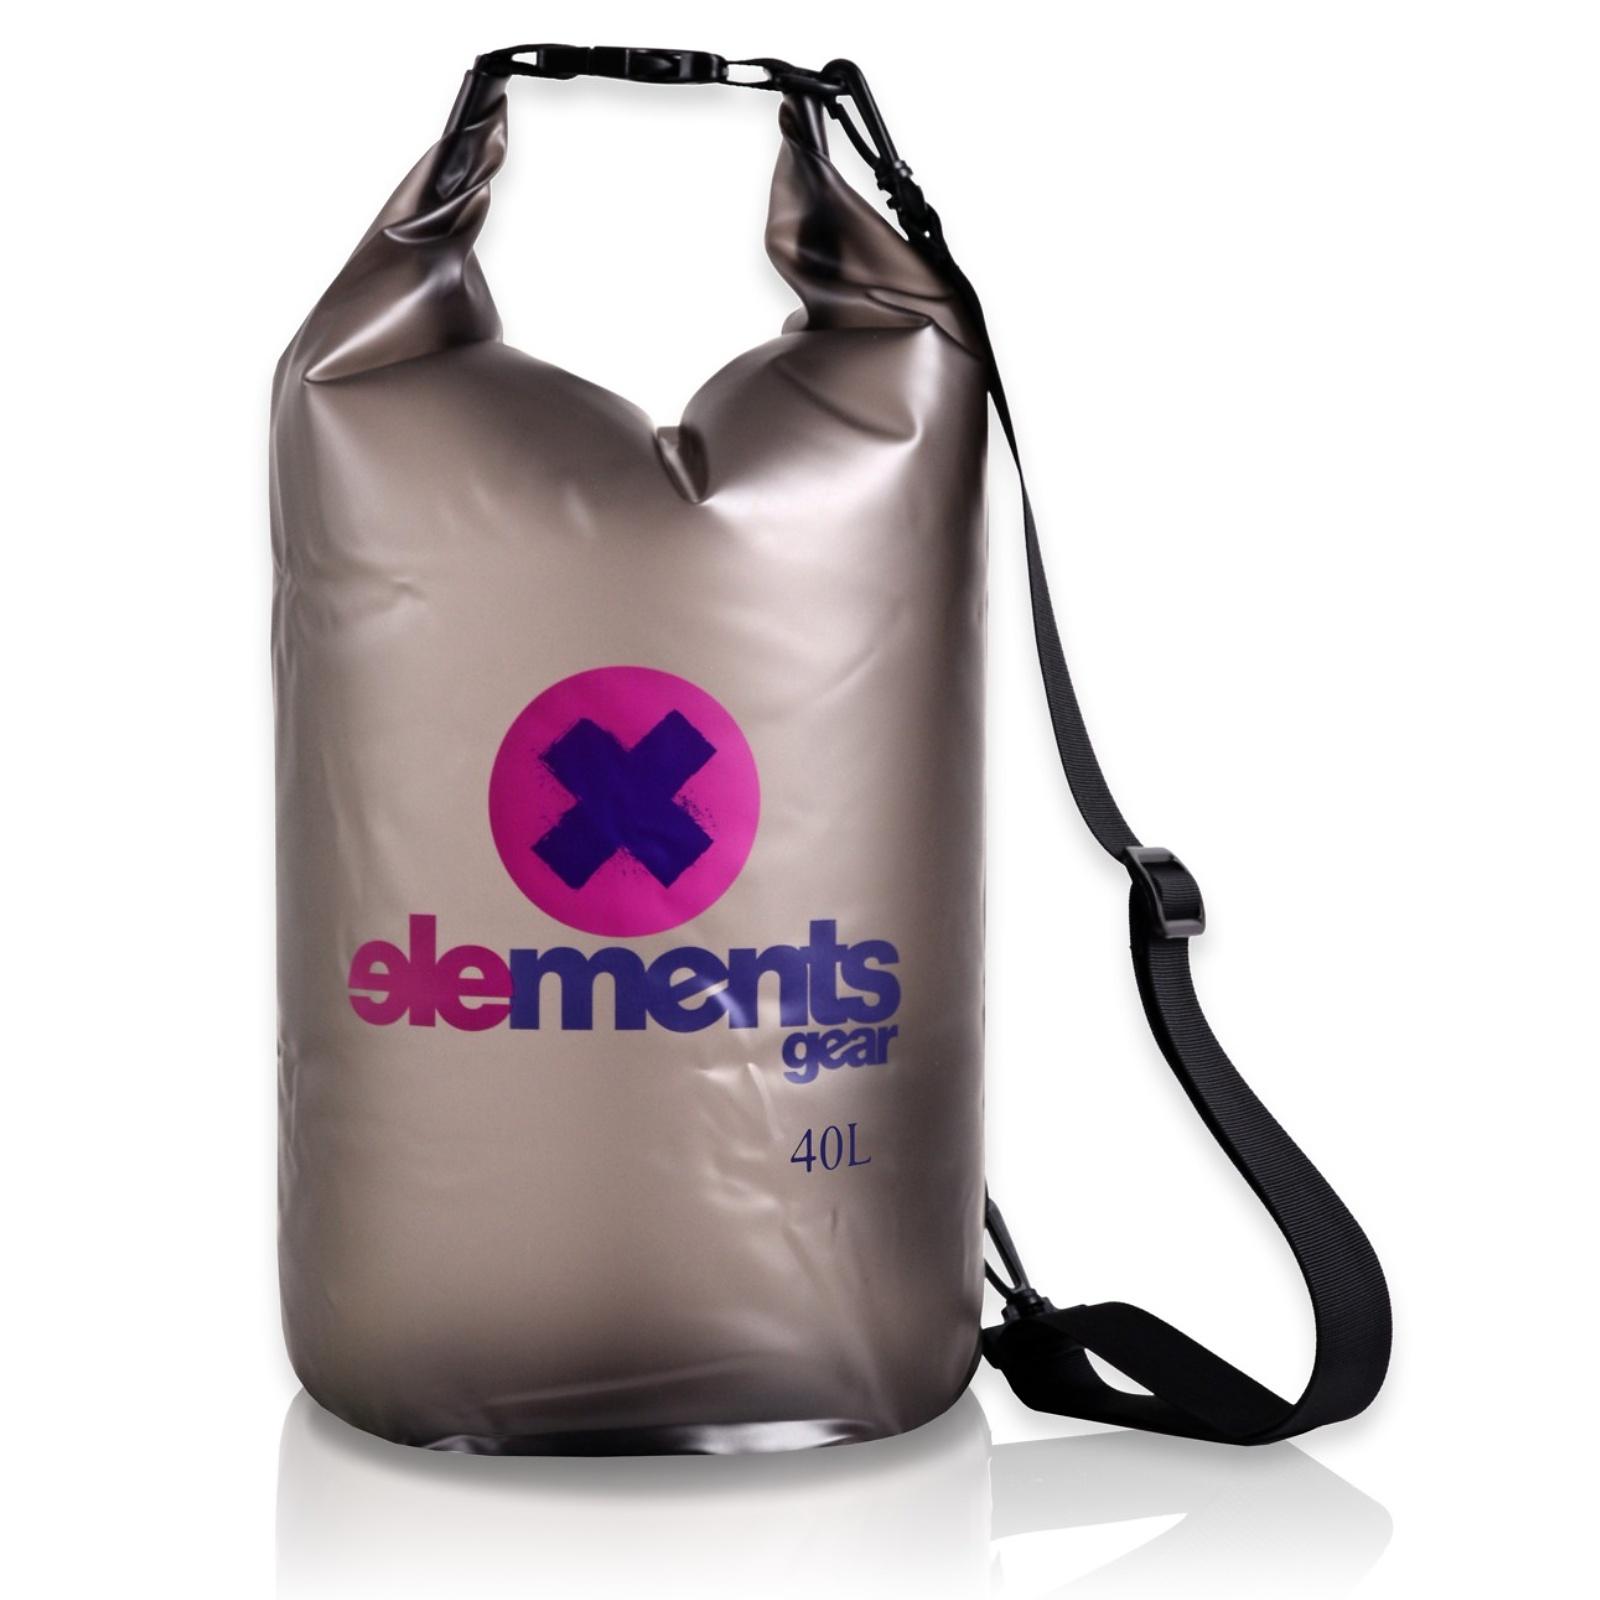 Lodný vak ELEMENTS GEAR Pro 40 L - sivý